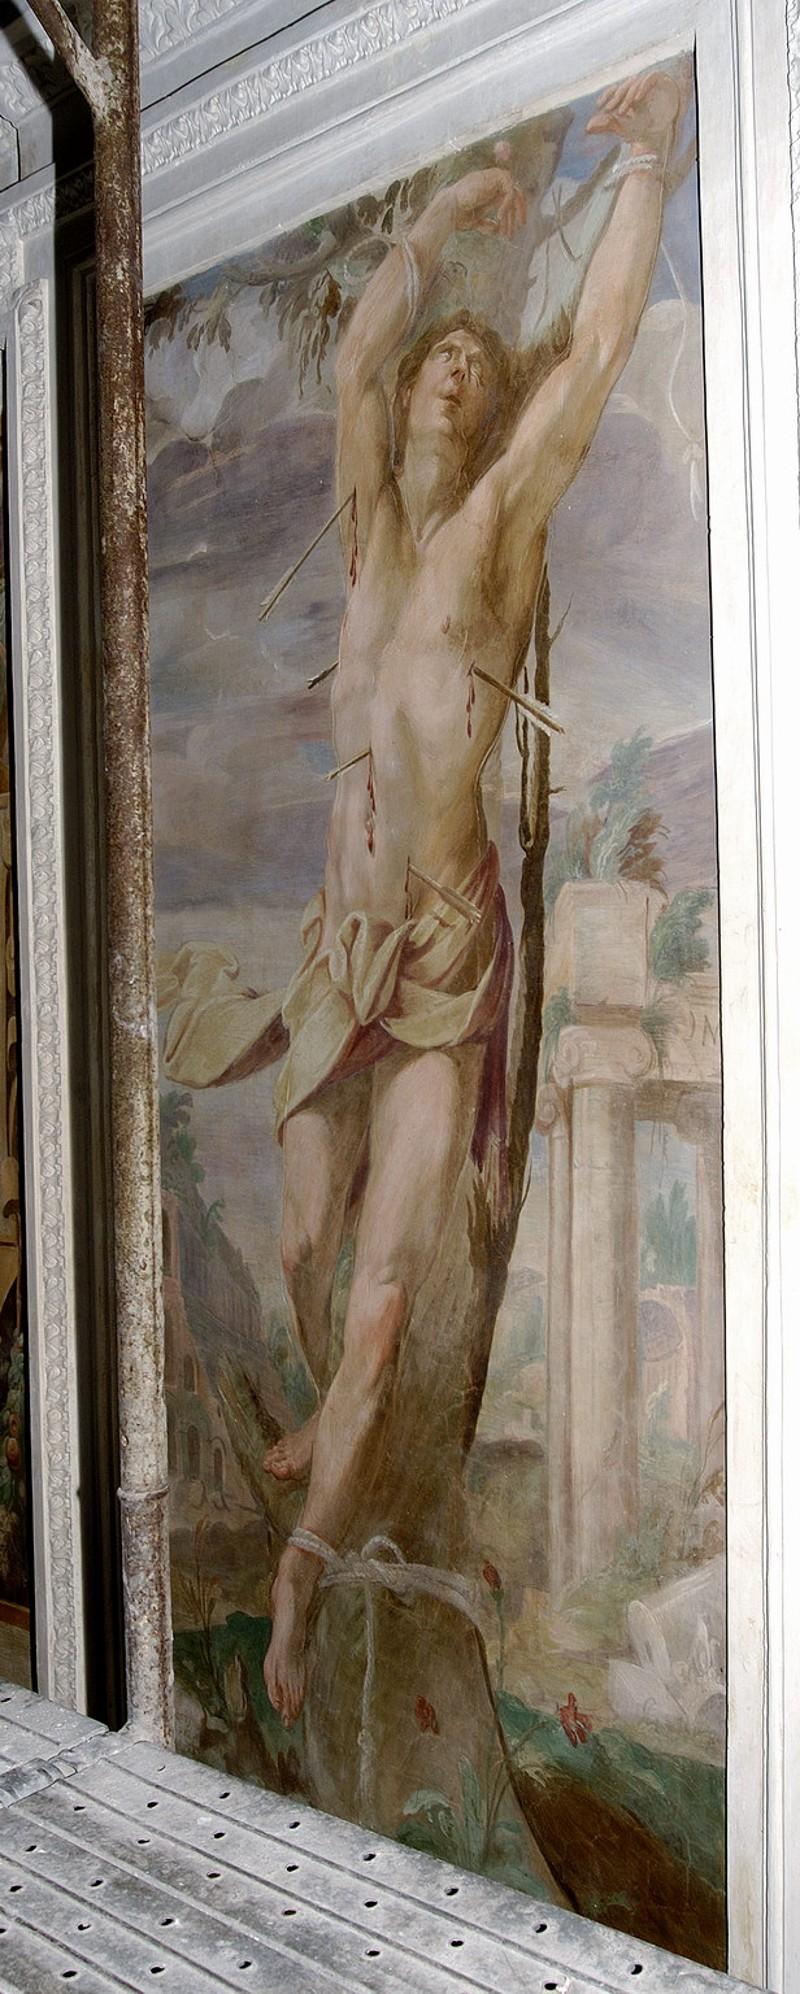 Panico A.M. (1572), San Sebastiano